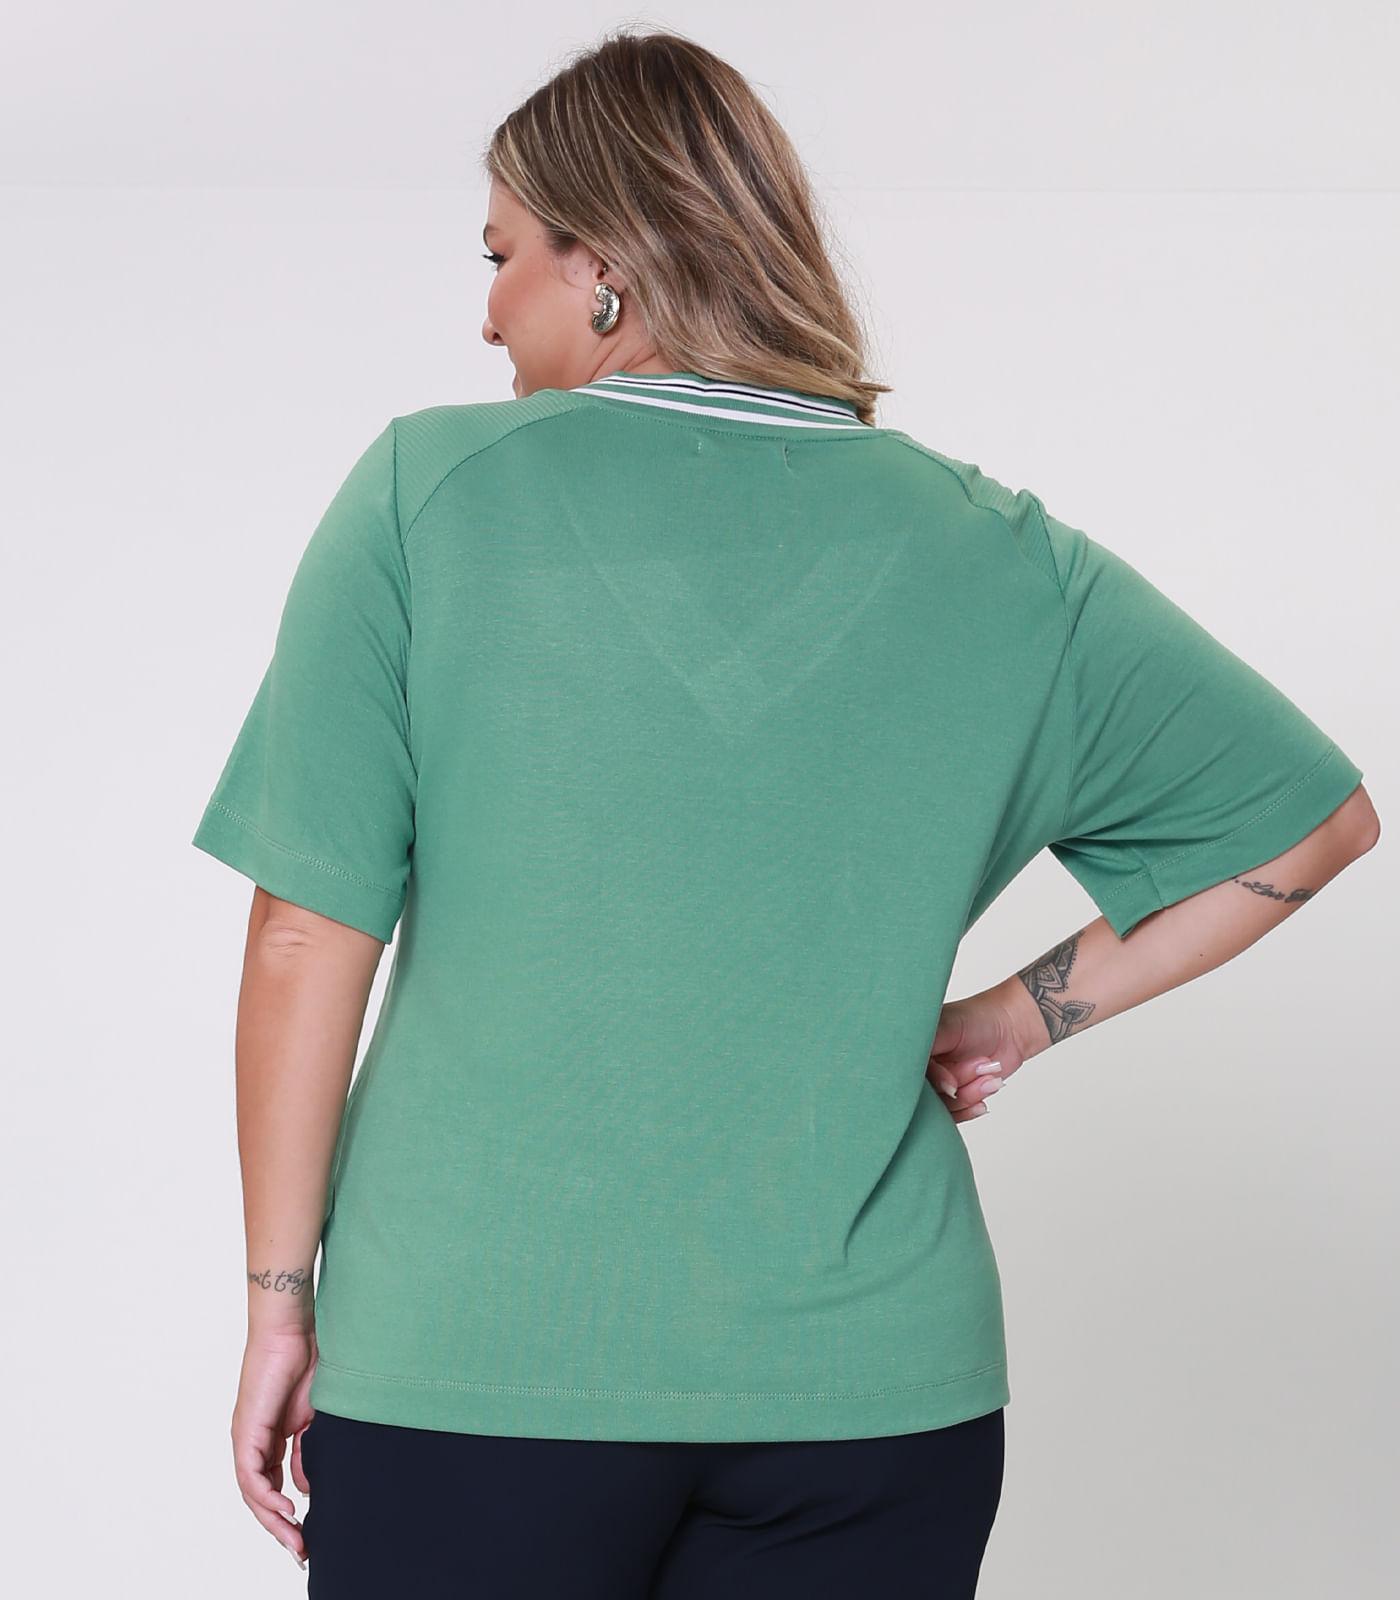 Blusa-Feminina-Plus-Size-Retilinea-Secret-Glam-Verde